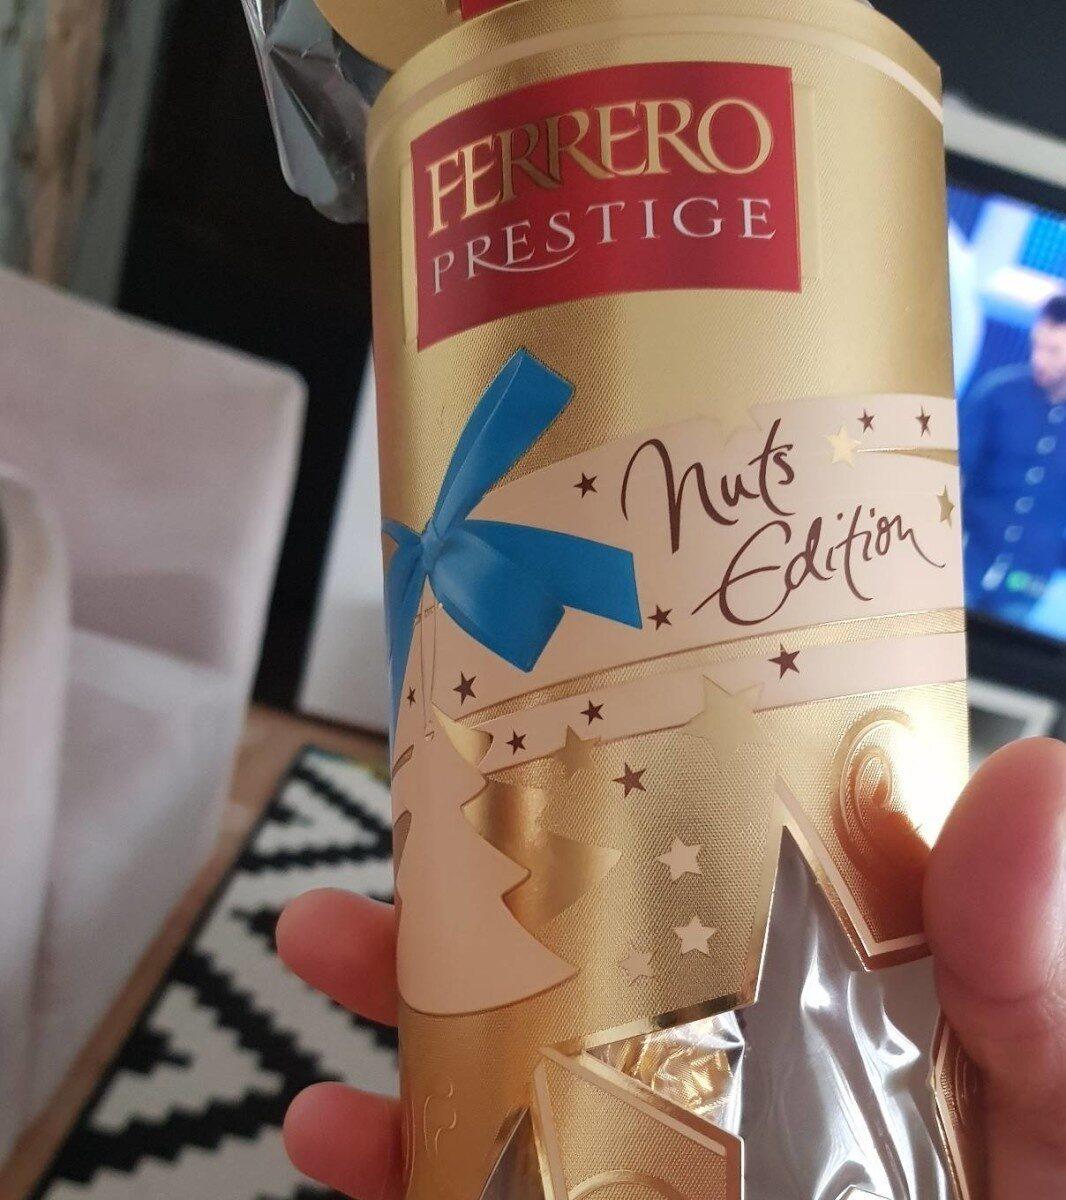 Ferrero prestige - Producte - es